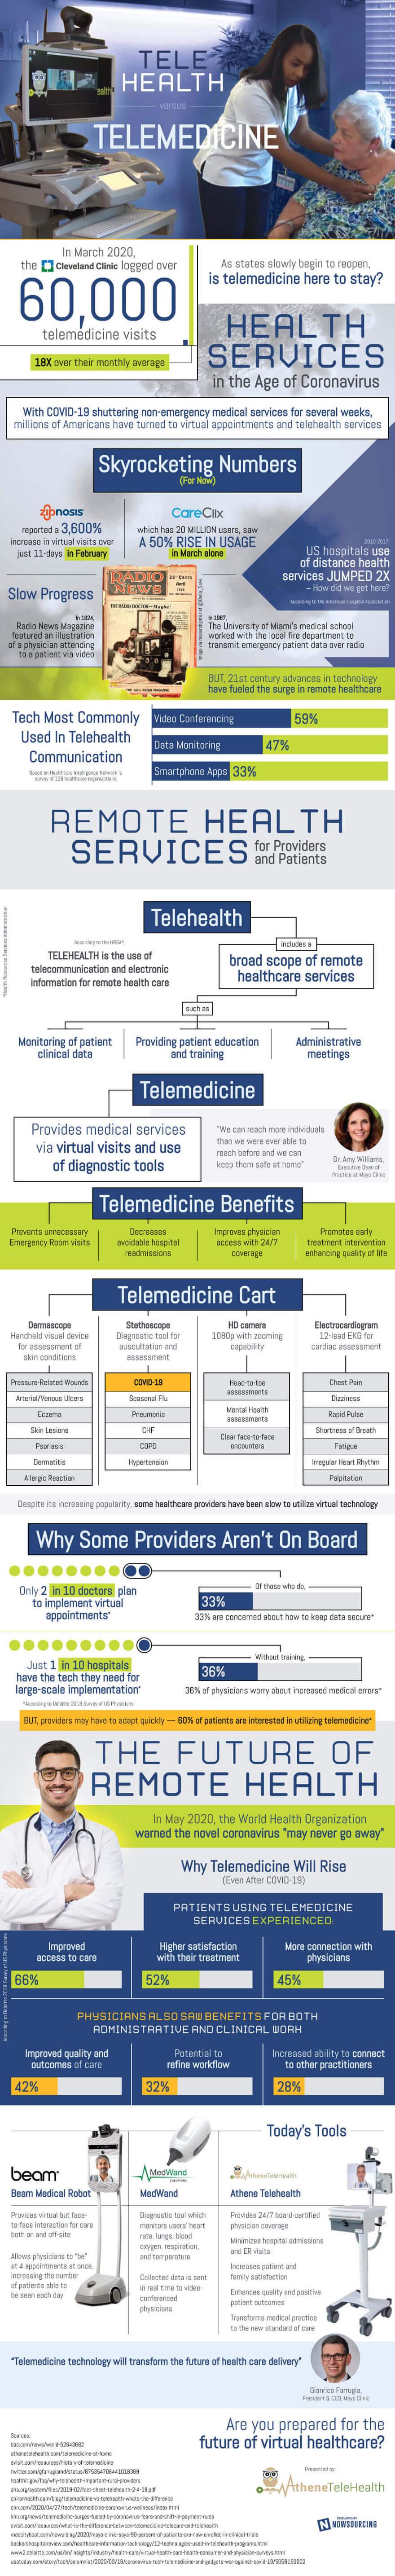 Telehealth vs Telemedicine infographic - mobile technology in healthcare